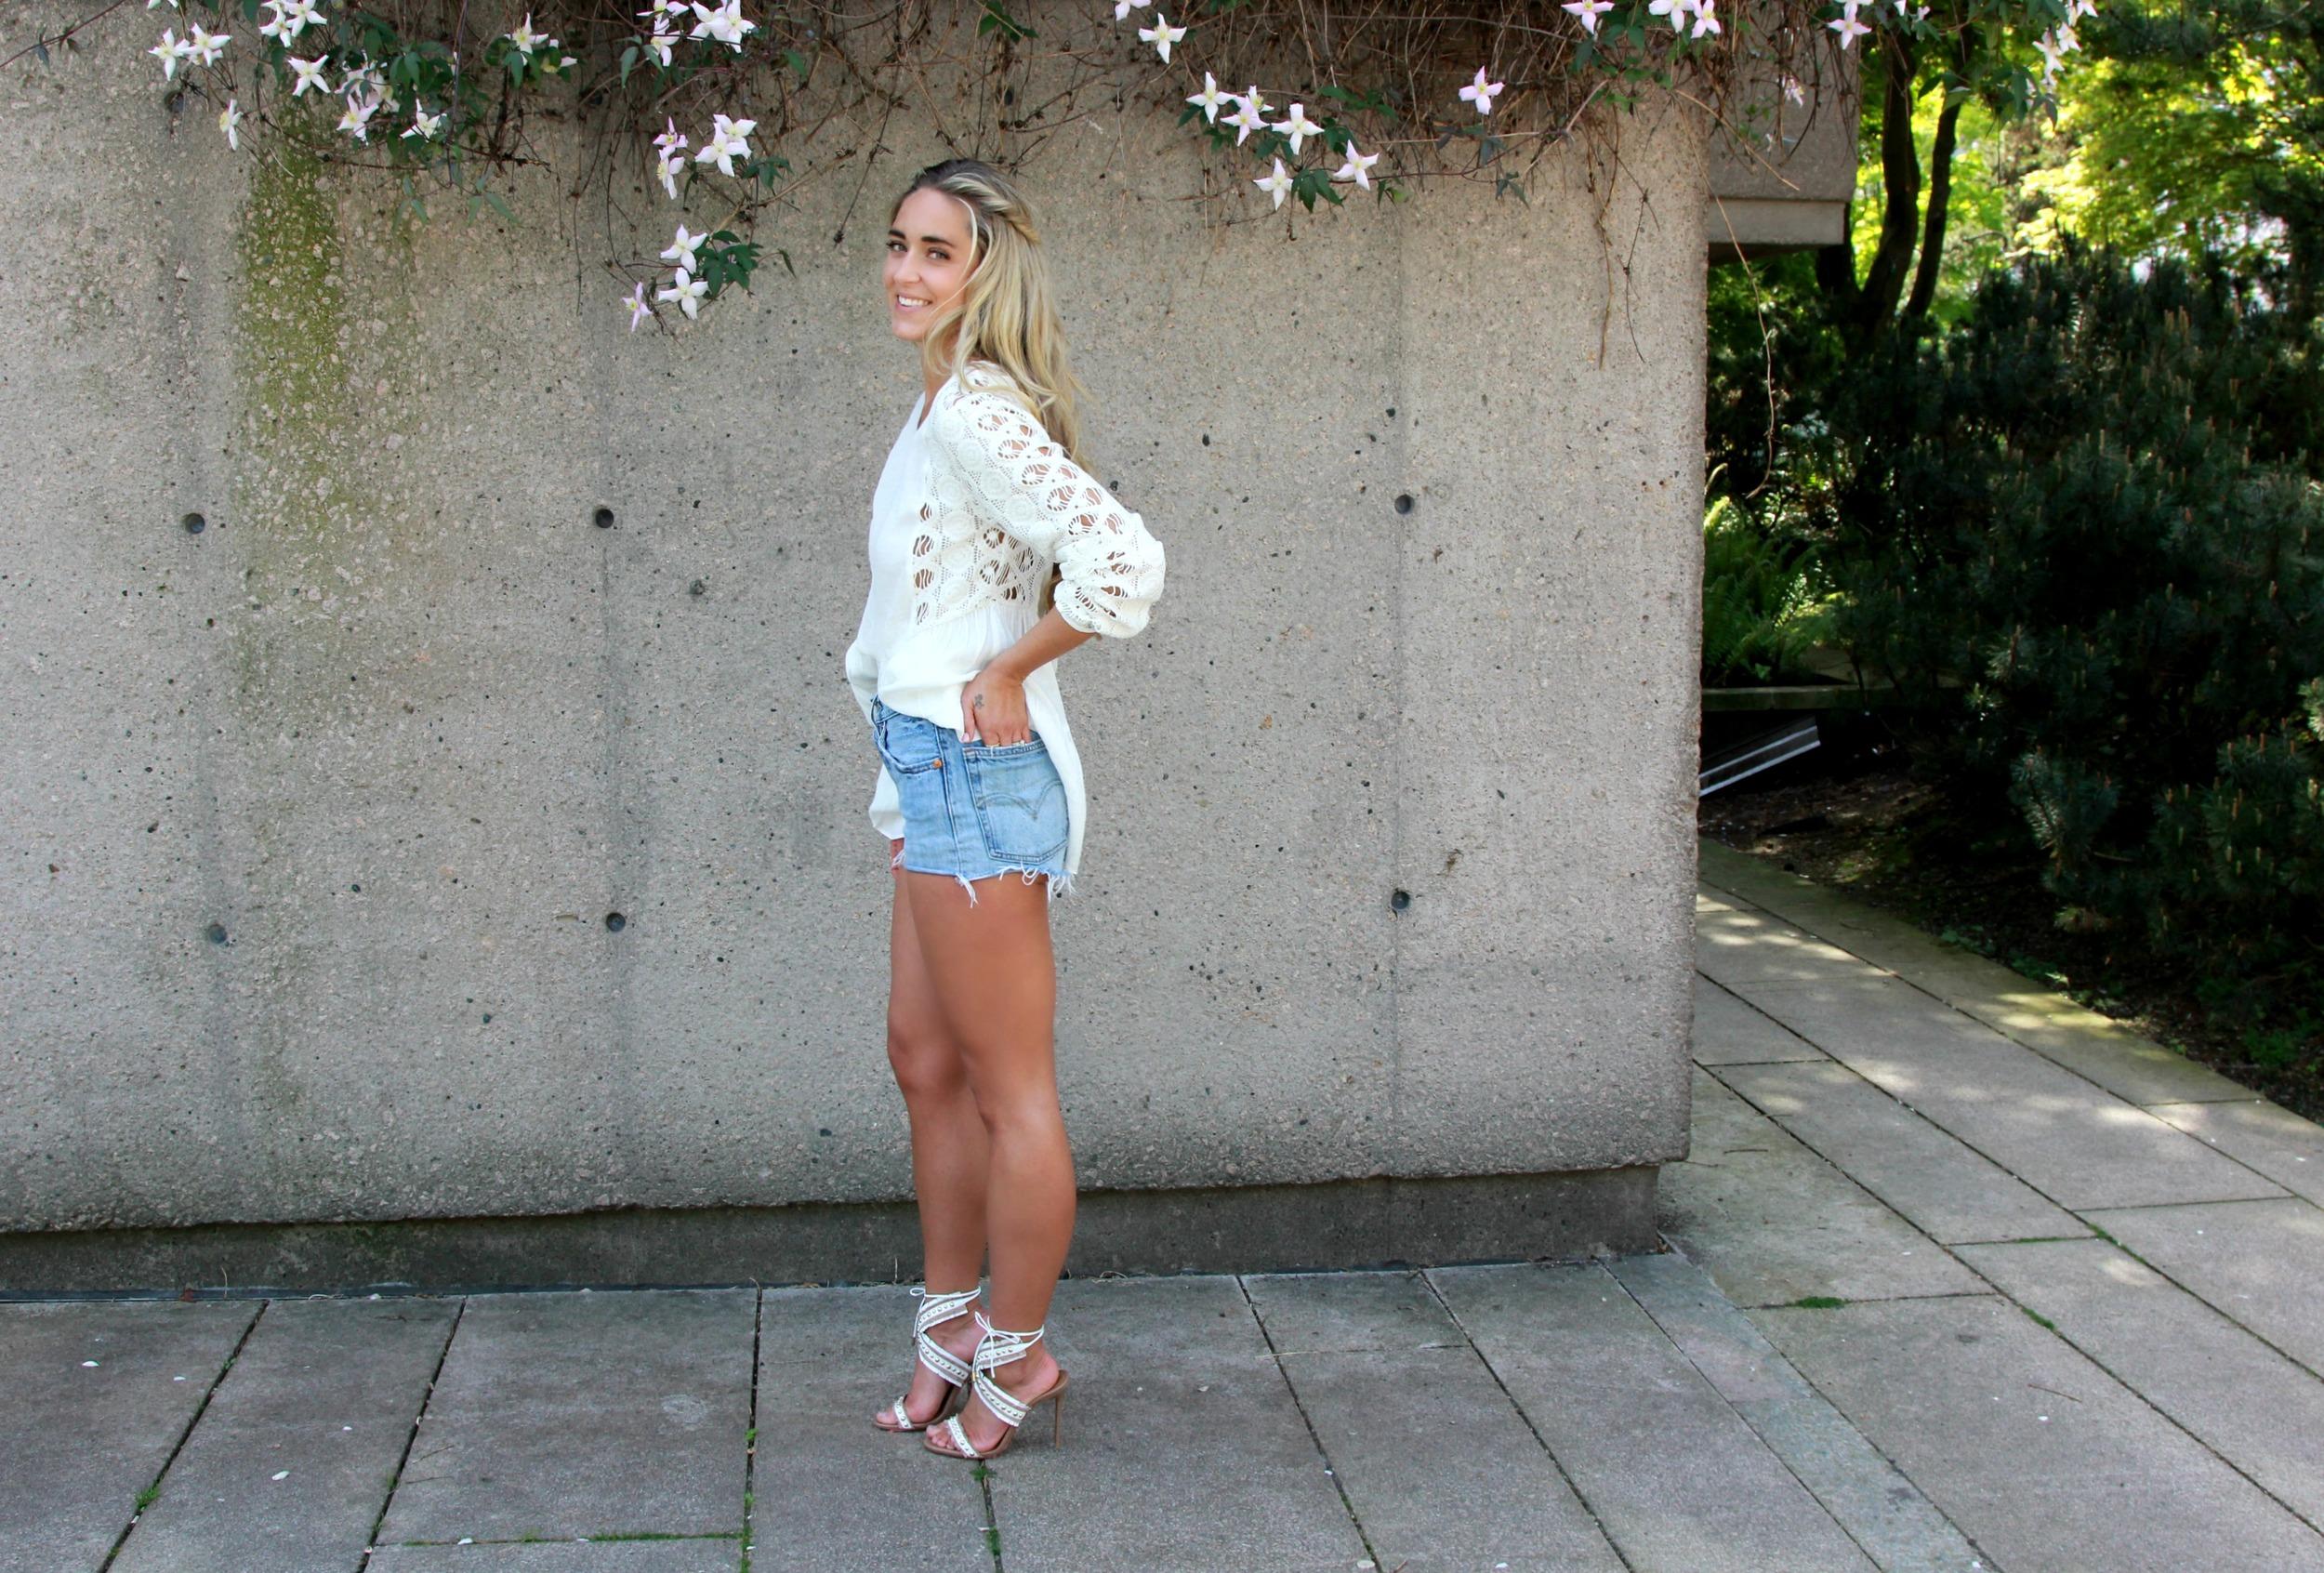 Aquazzura  Sandals via  The September   Ruby  Dress,  d.RA   Top  &  Skirt ,  Chloé  Bag,  Wish  Top, Levi's Shorts